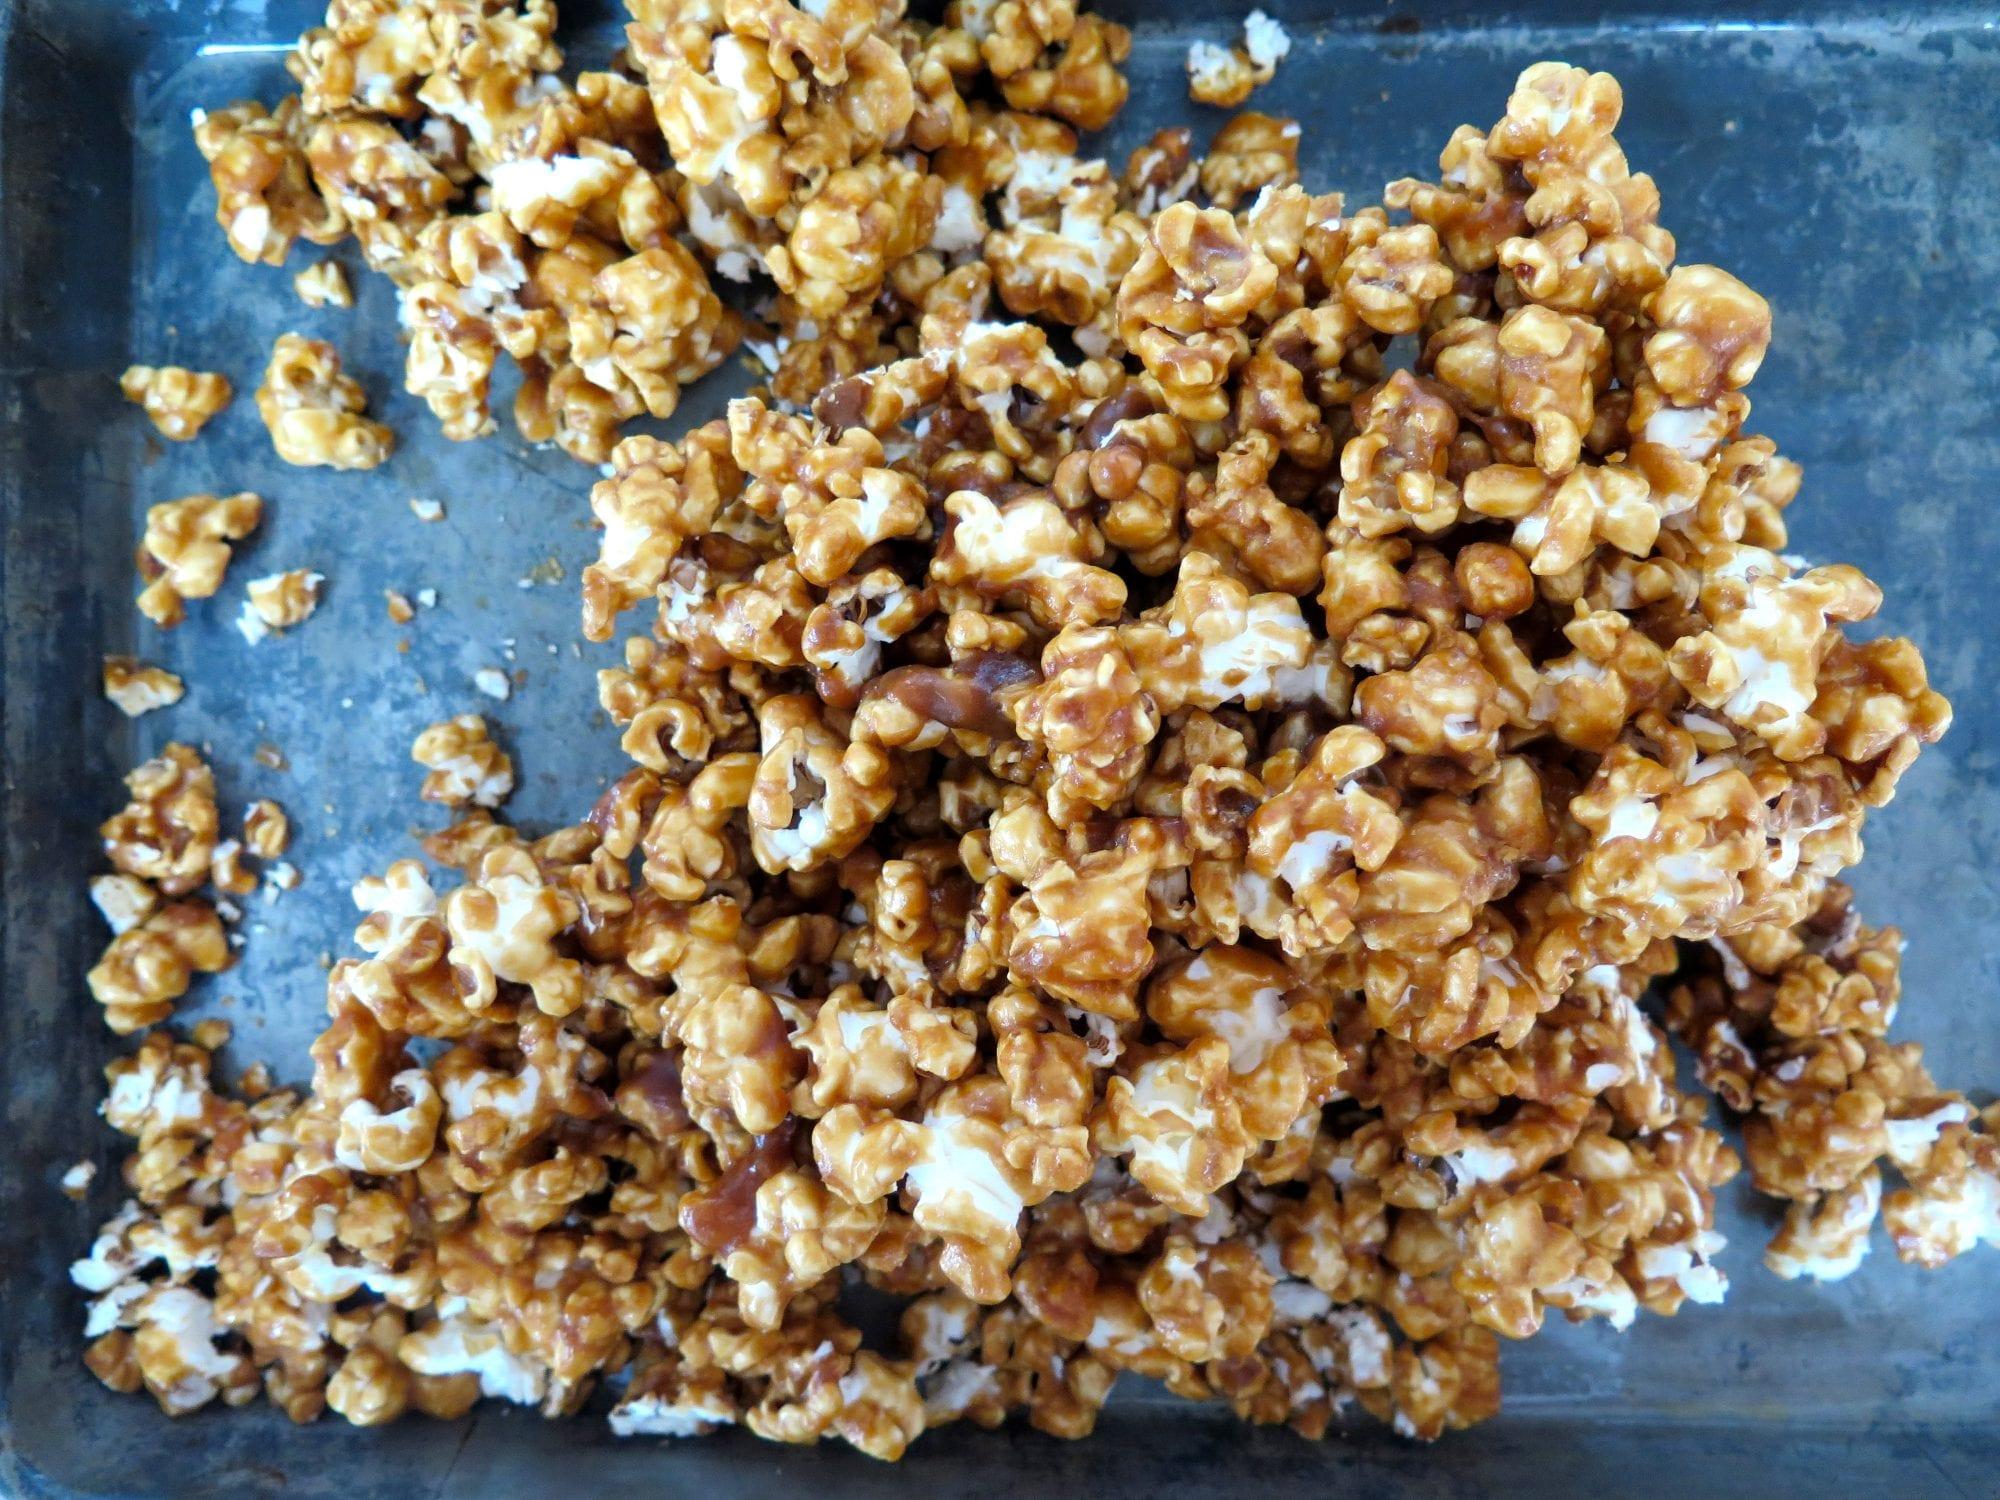 caramel popcorn (candy)